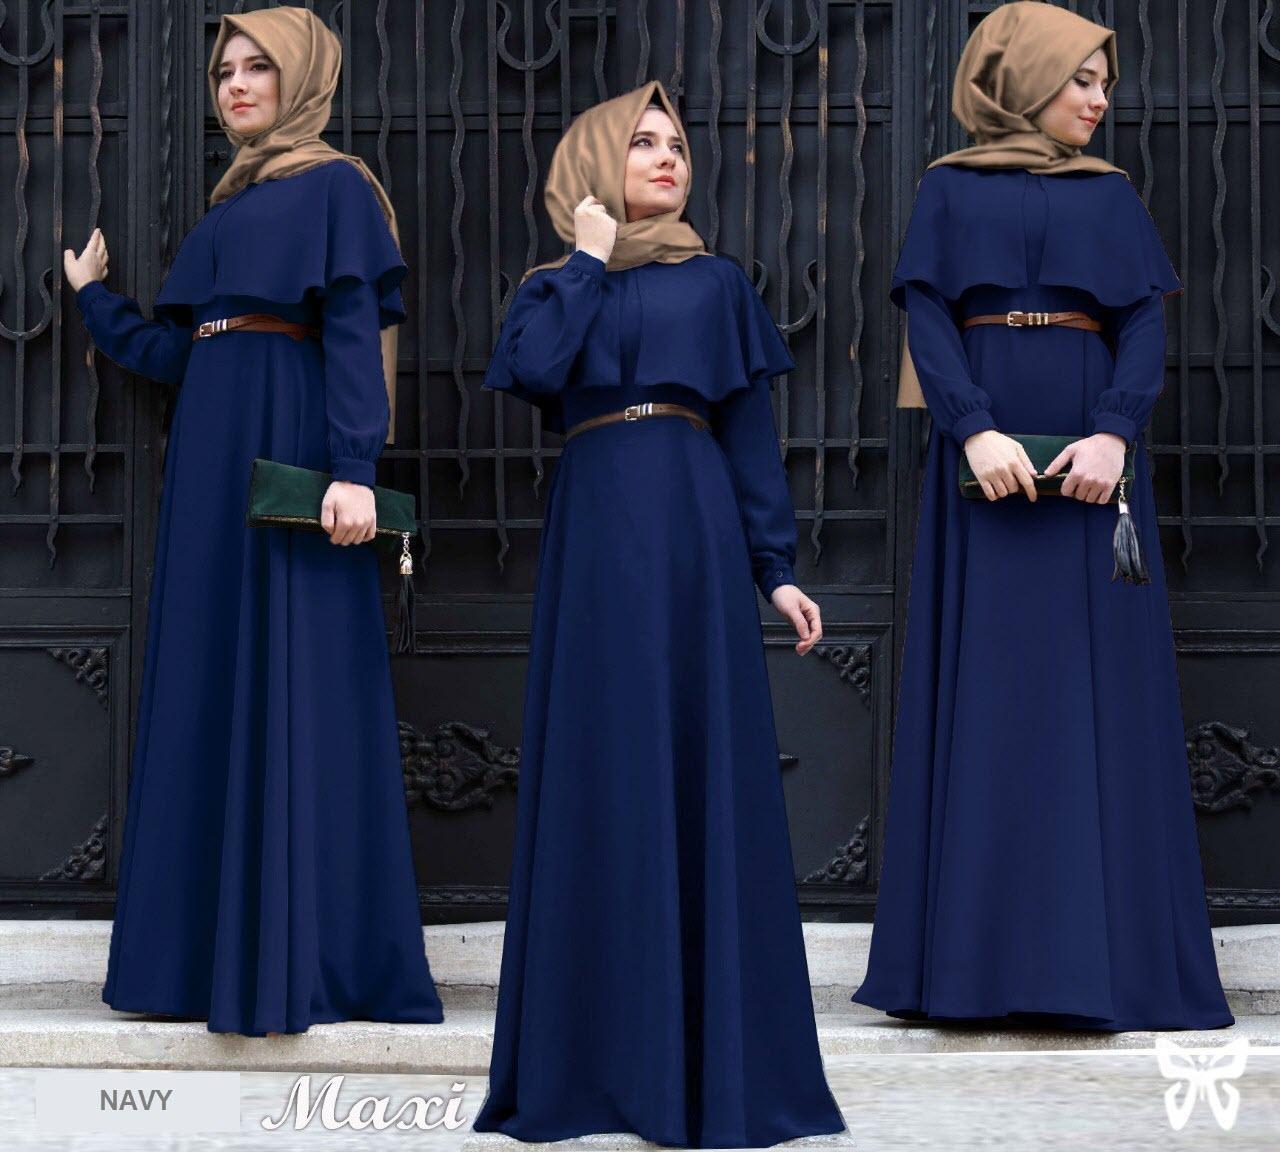 Flavia Store Maxi Dress Lengan Panjang Set 3 in 1 FS0622 - NAVY BIRU DONGKER / Gamis Syari / Gaun P